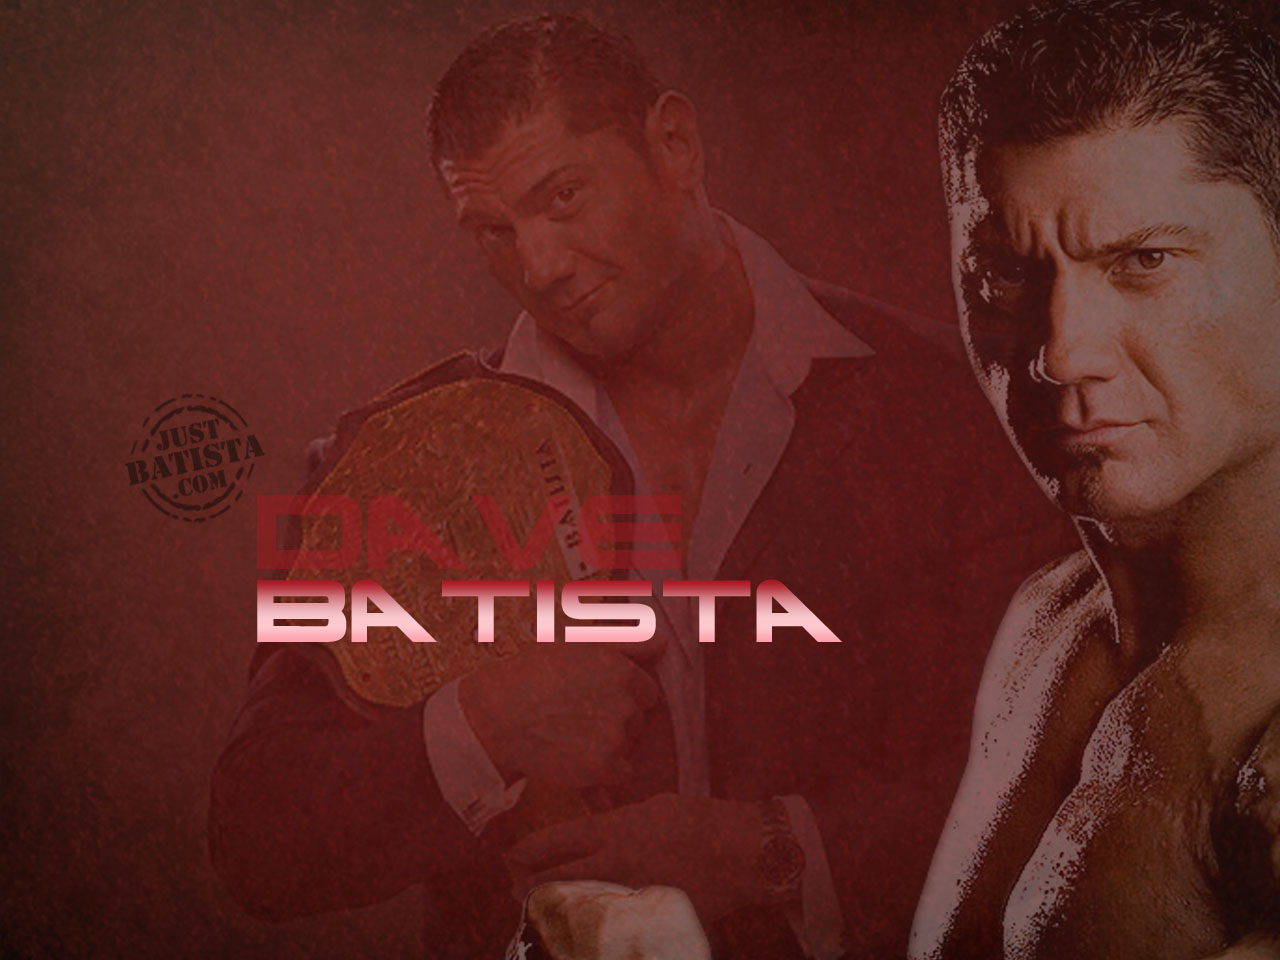 http://3.bp.blogspot.com/-qtpOMTgzro8/Tb-3gJeUEpI/AAAAAAAACWI/JGozIhWL1so/s1600/Batista-Wallpaper-3.jpg